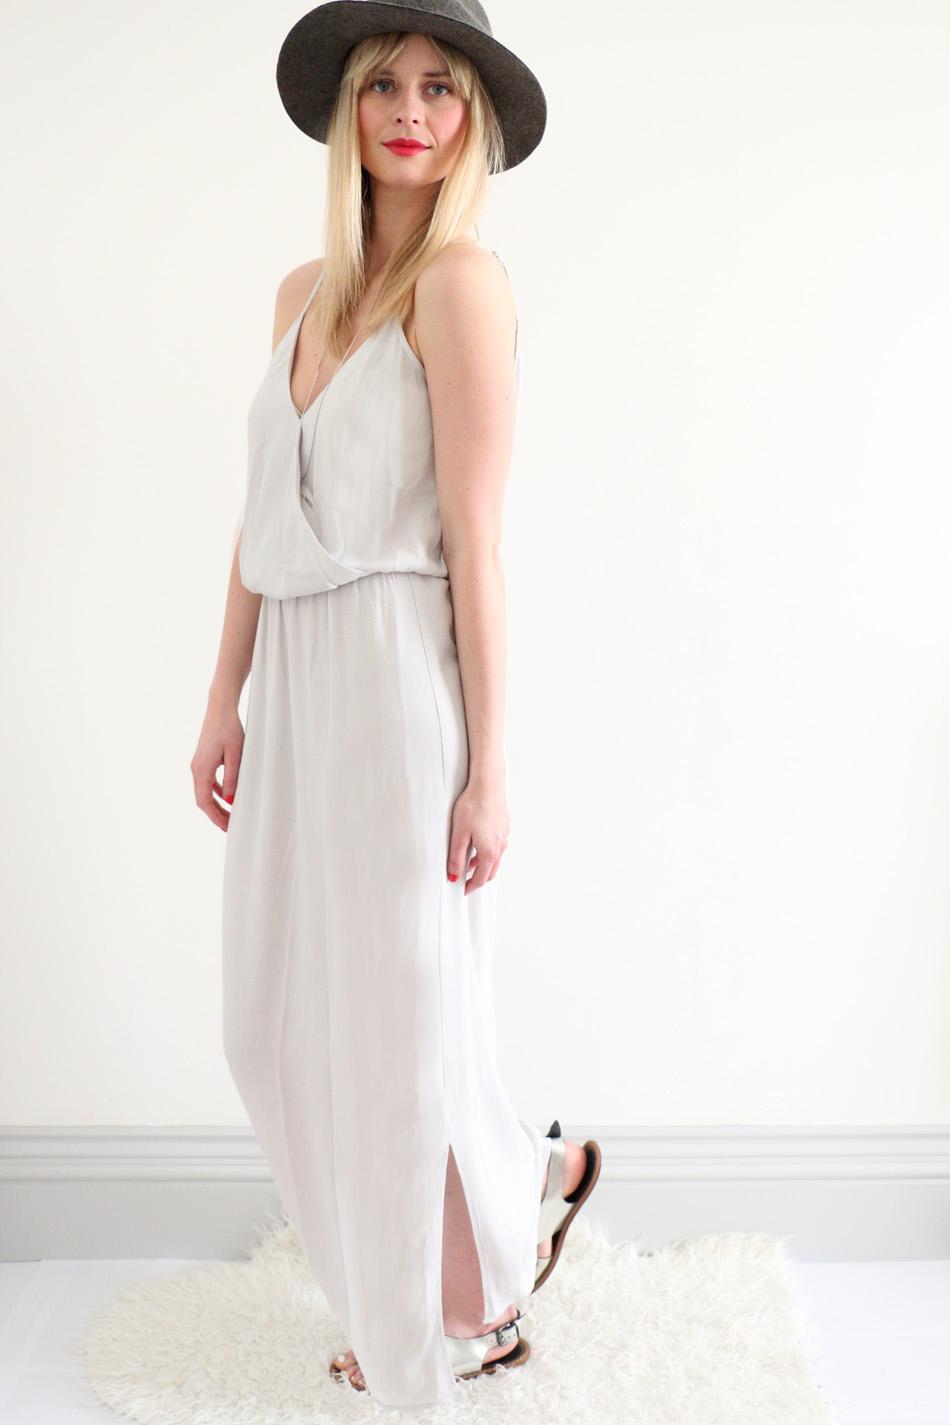 FD American Vintage dress IMG_1076 950px